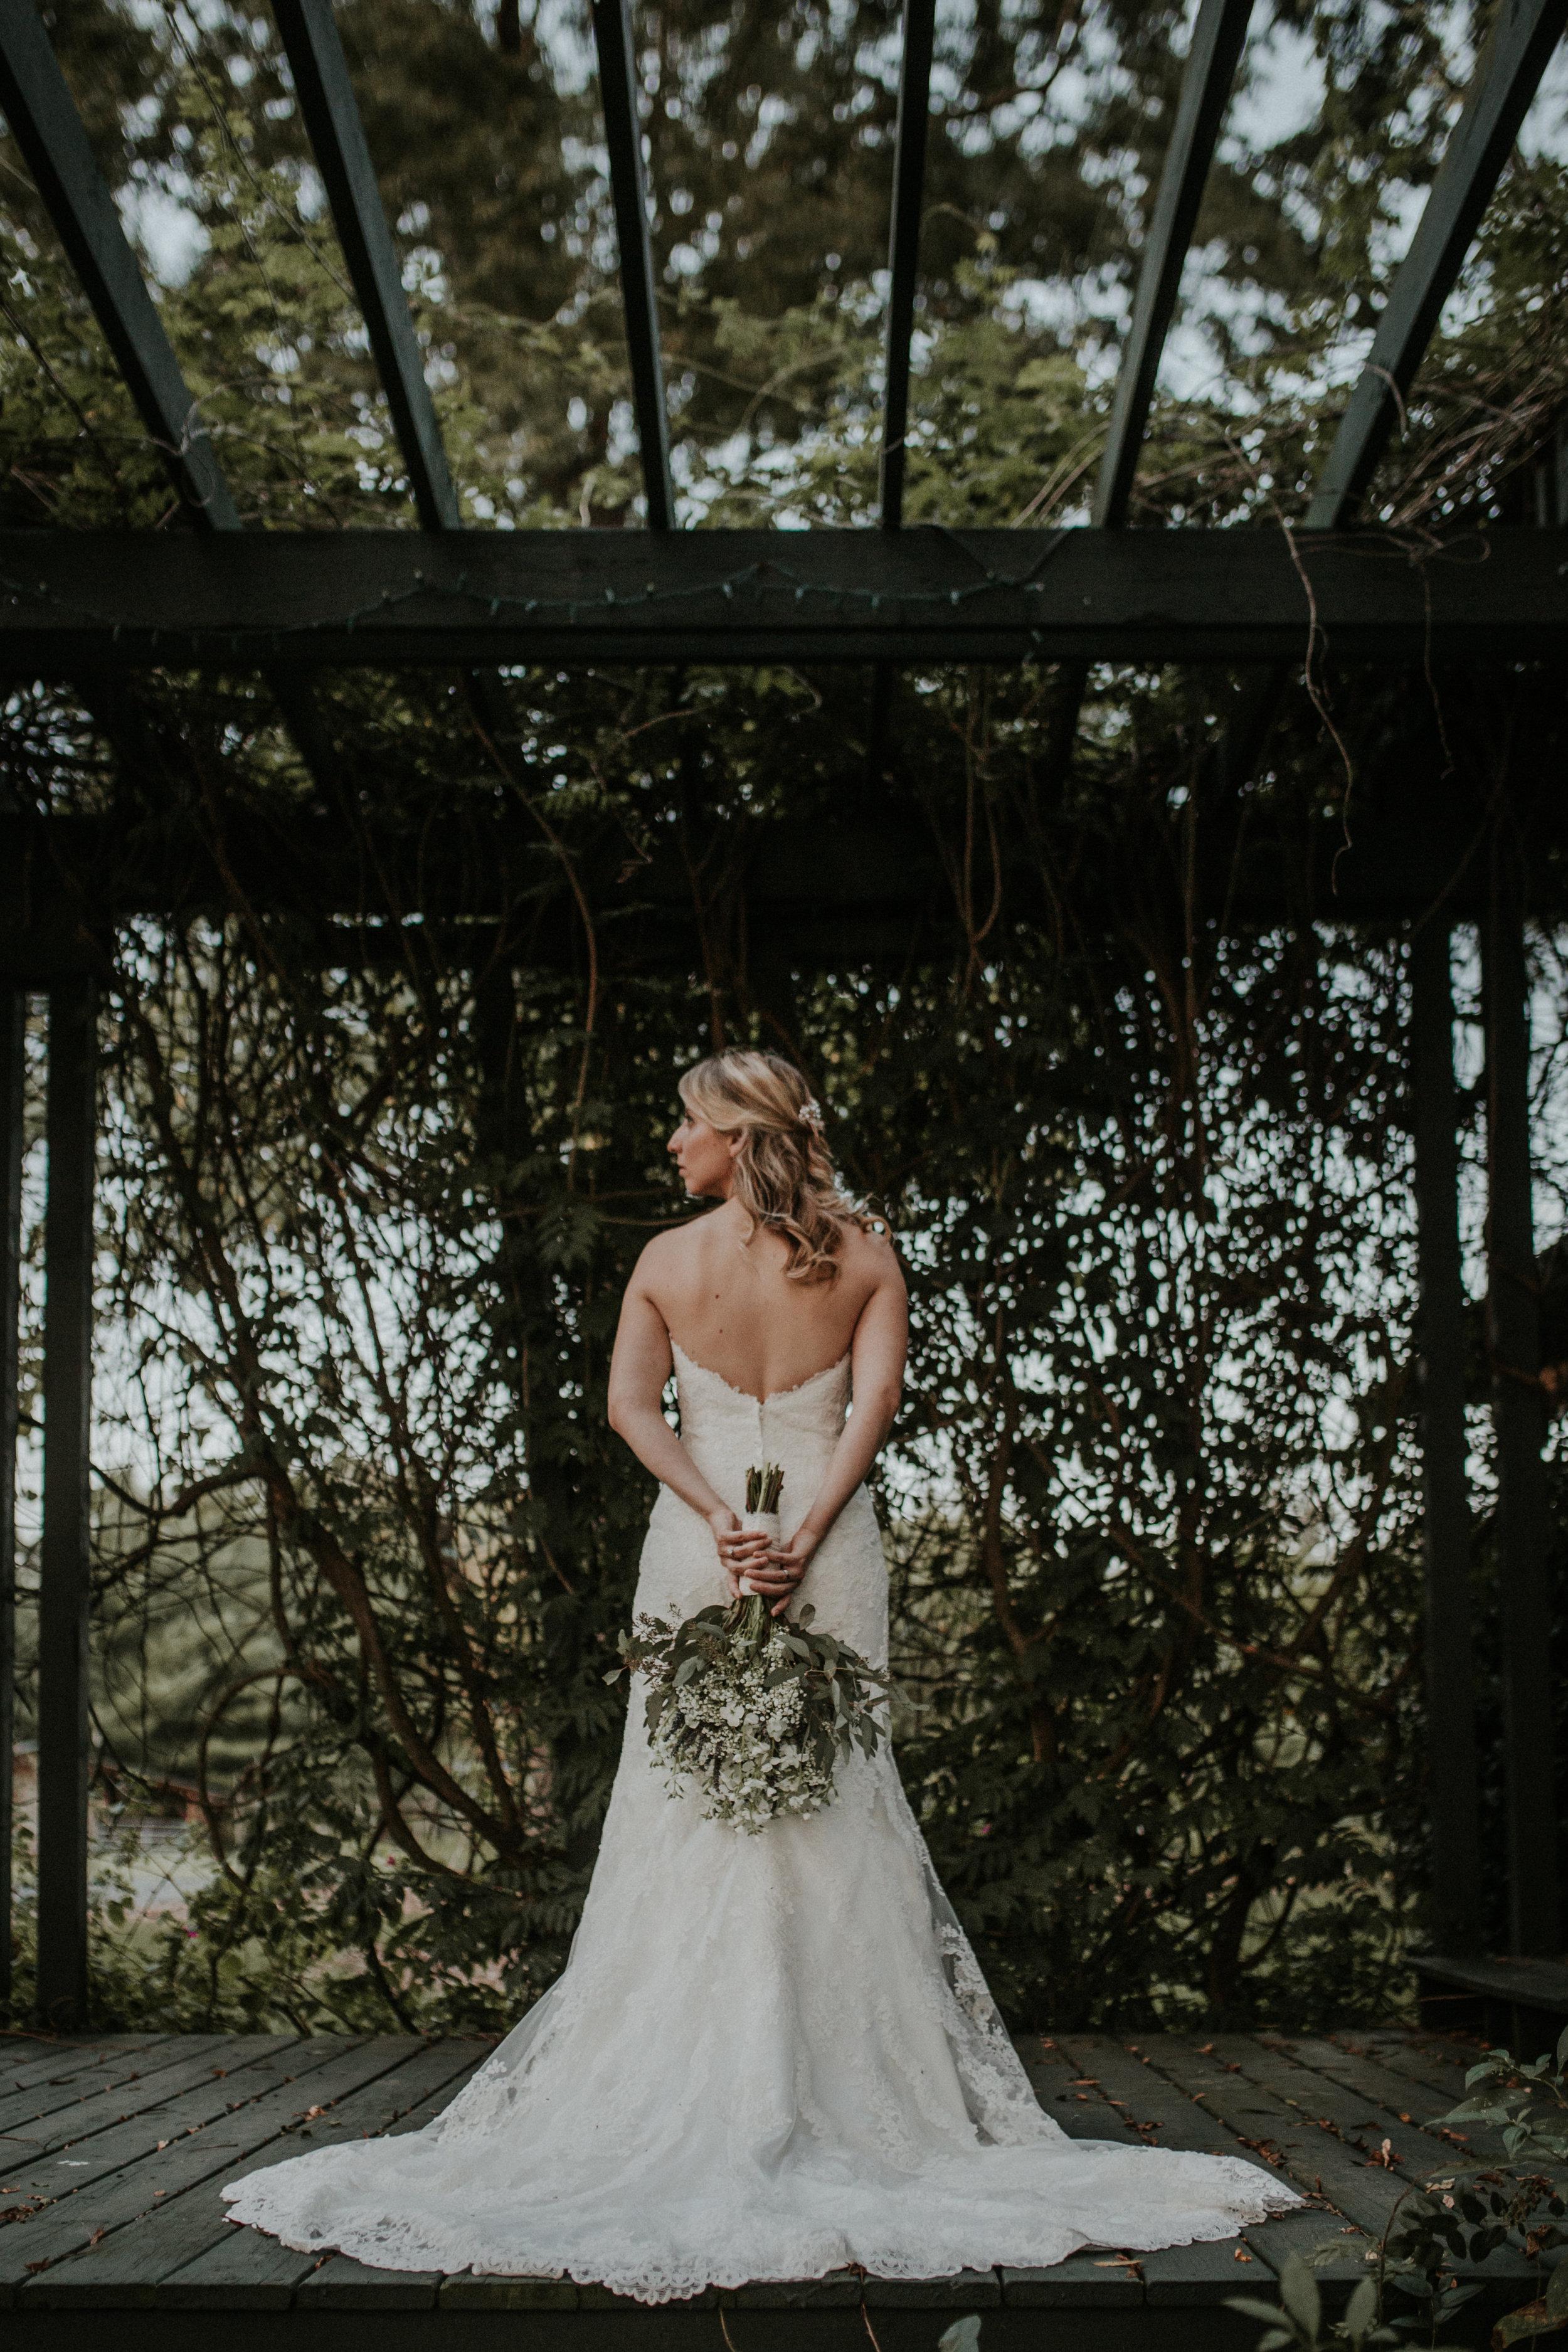 charlotte-wedding-photographer-daniel-stowe-2534.jpg